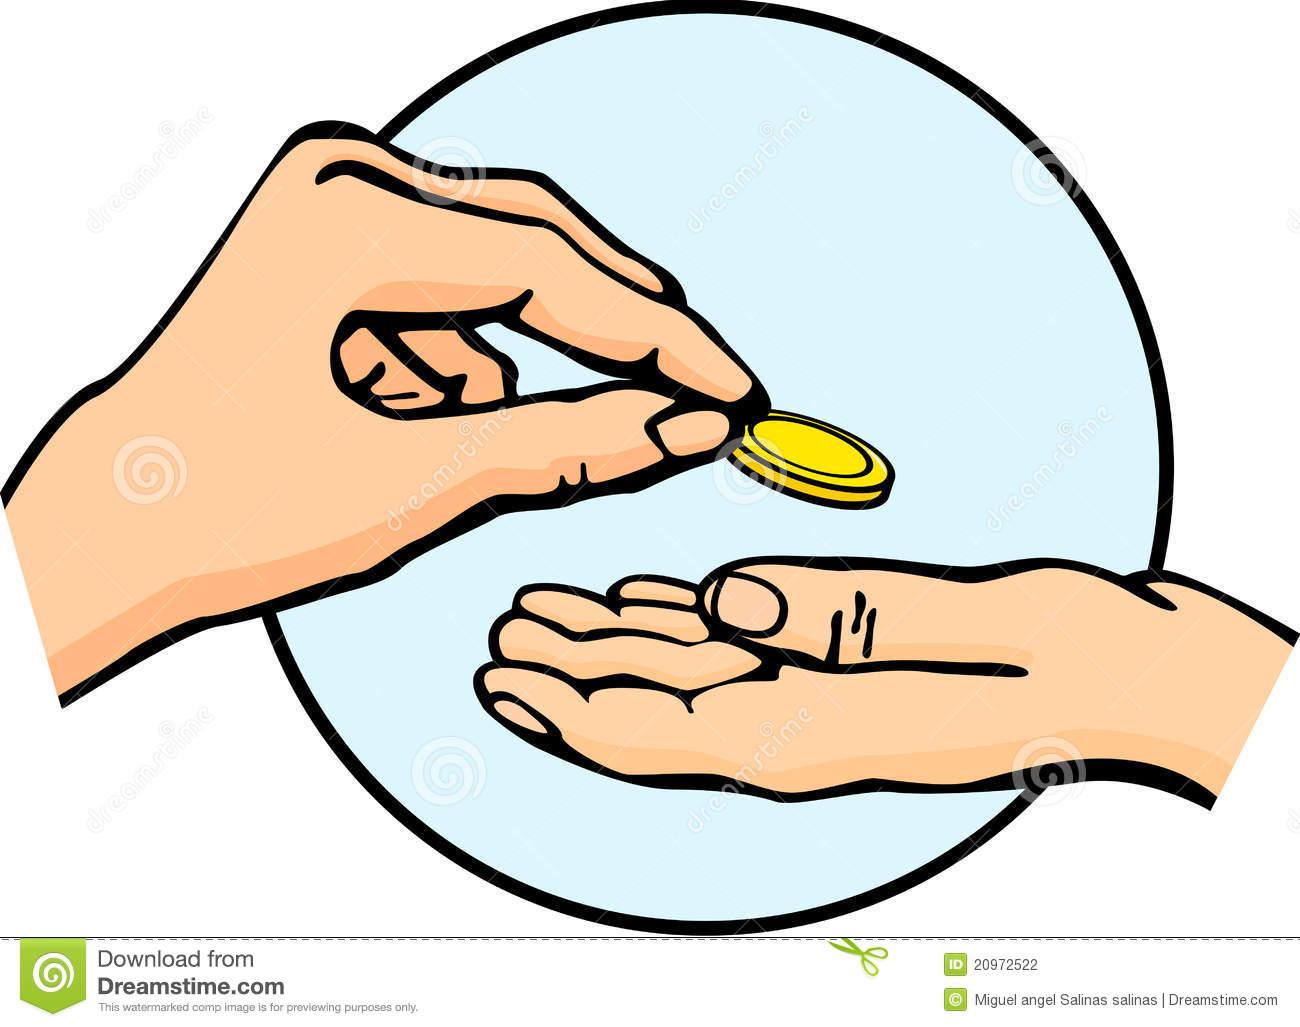 Money Donation Clipart - Clipart Suggest